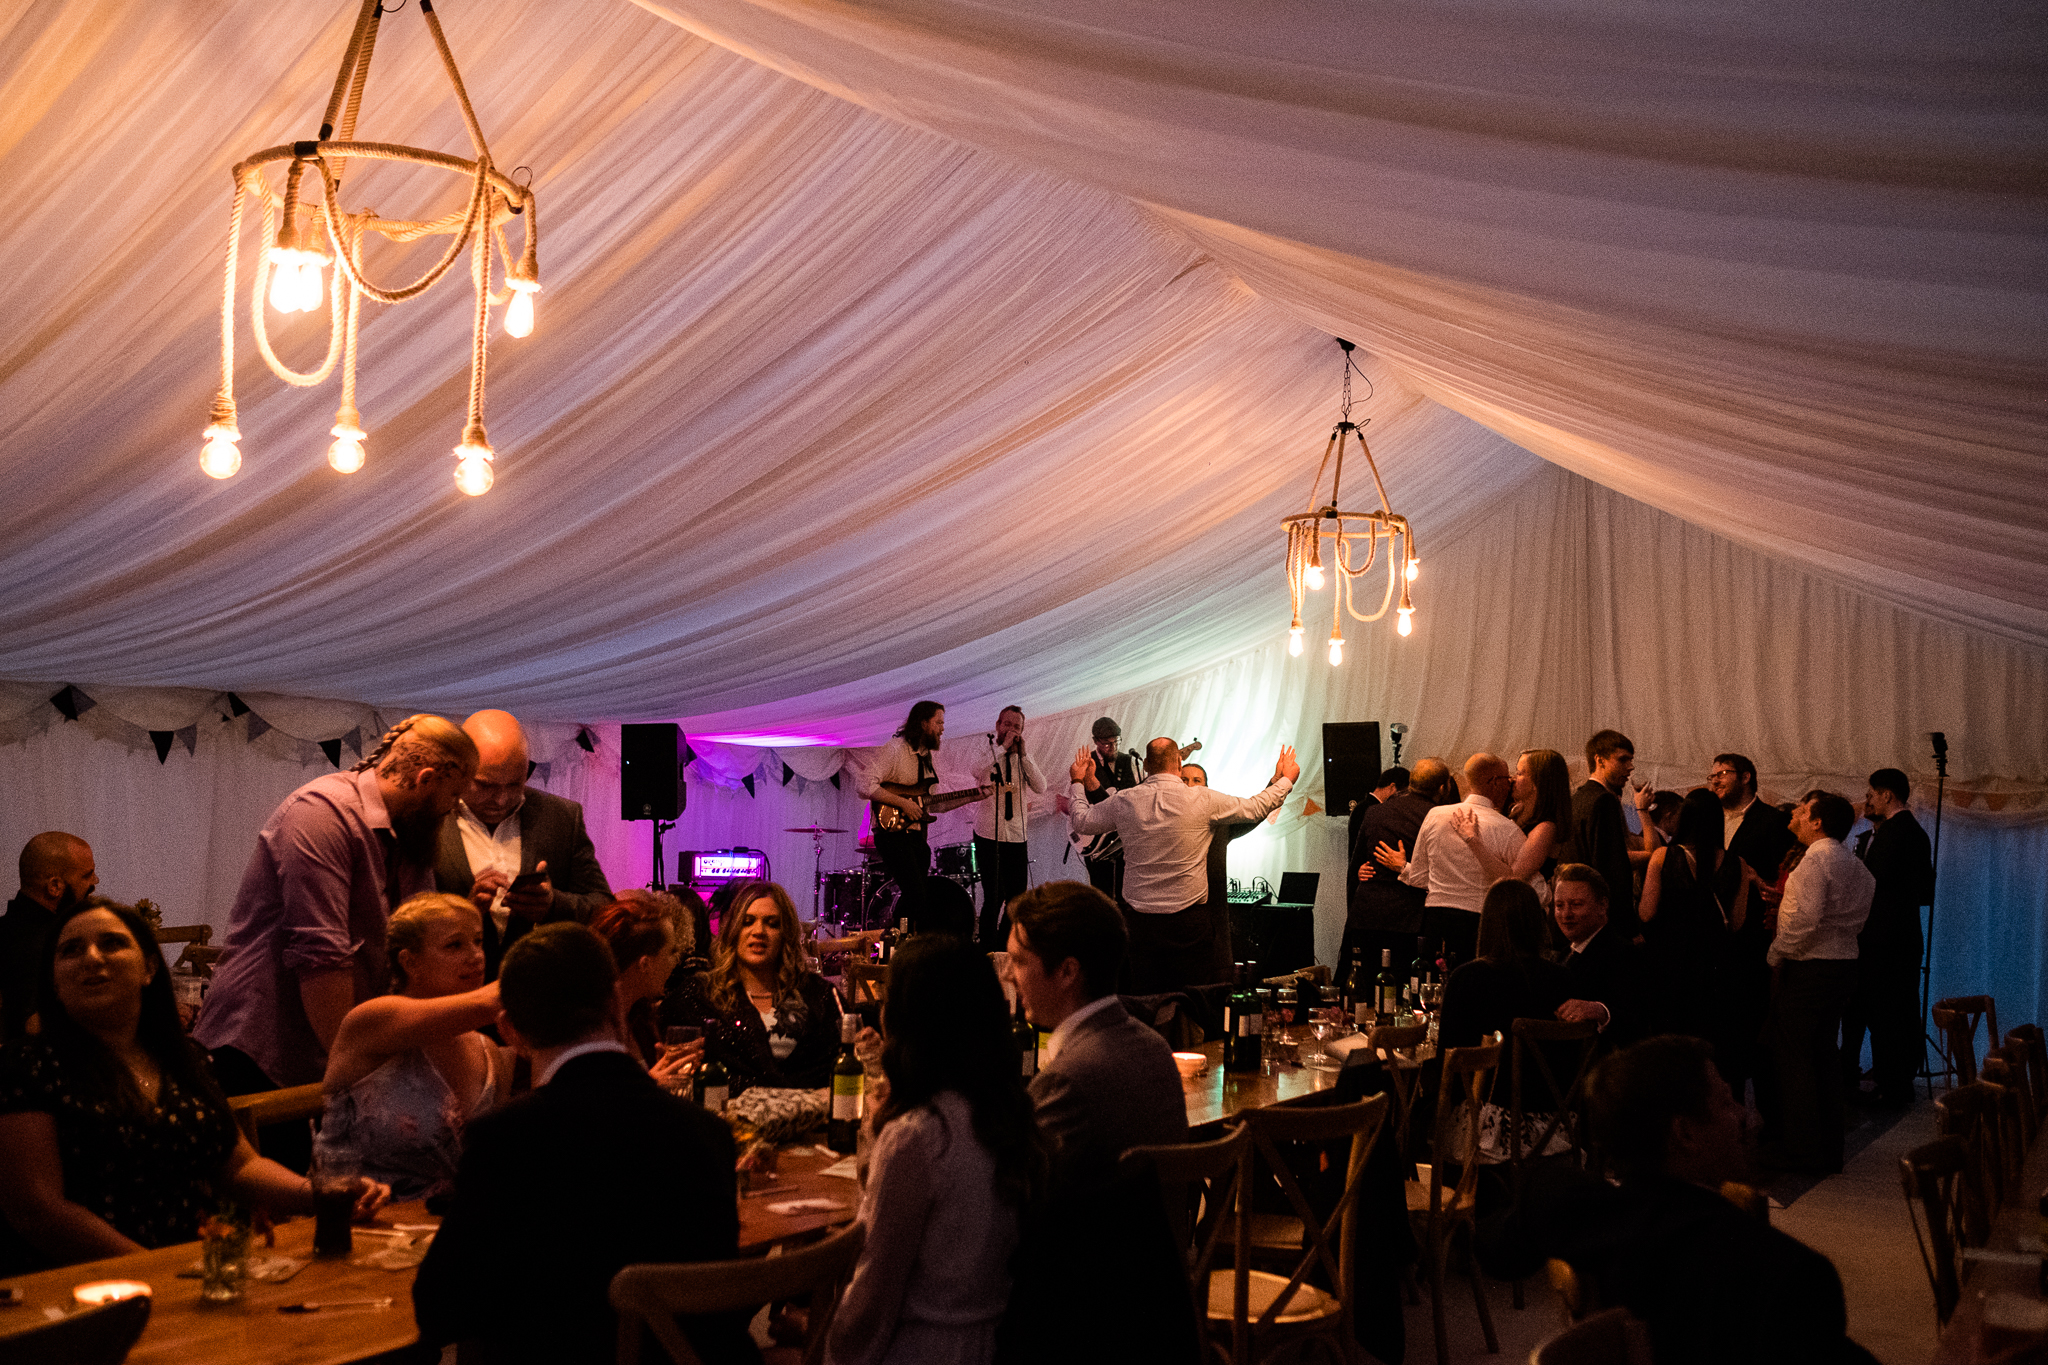 Relaxed Documentary Wedding Photography at The Wizard Inn, Alderley Edge Cheshire - Jenny Harper-87.jpg